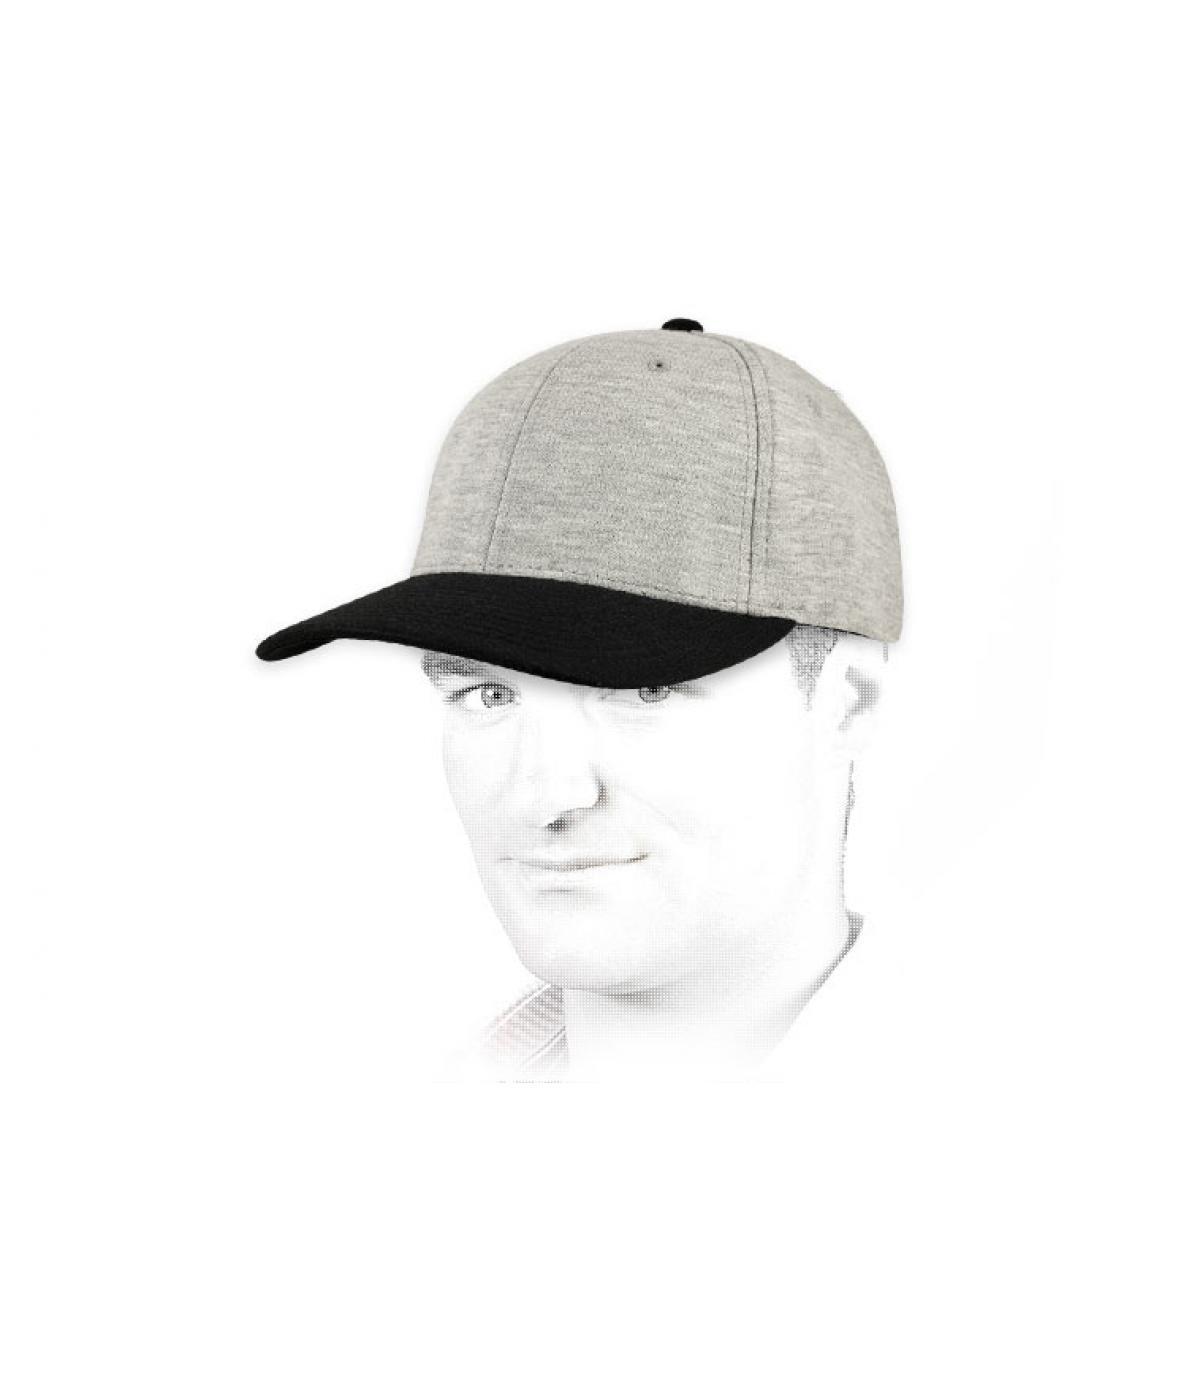 Cap Jersey graue schwarze